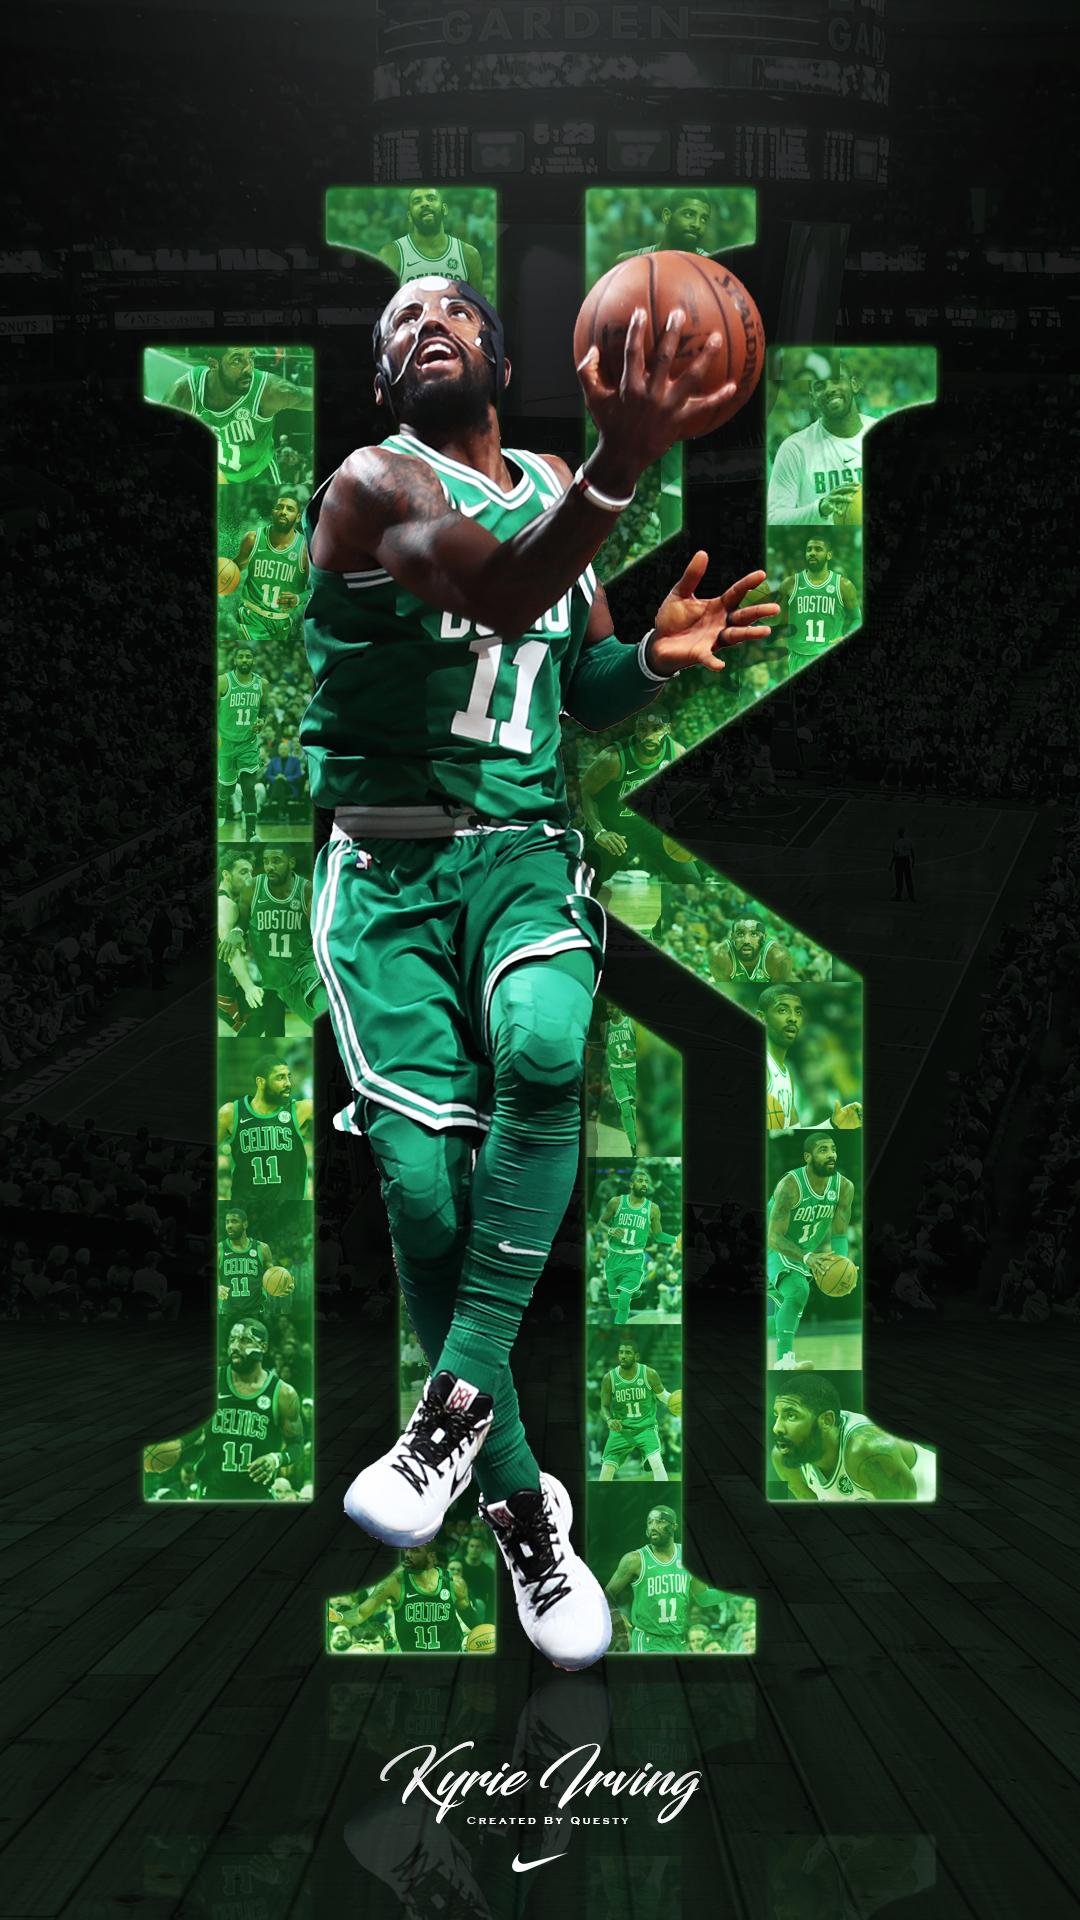 Cartoon Kyrie Irving Phone Wallpaper In 2020 Basketball Wallpaper Kyrie Irving Celtics Irving Wallpapers